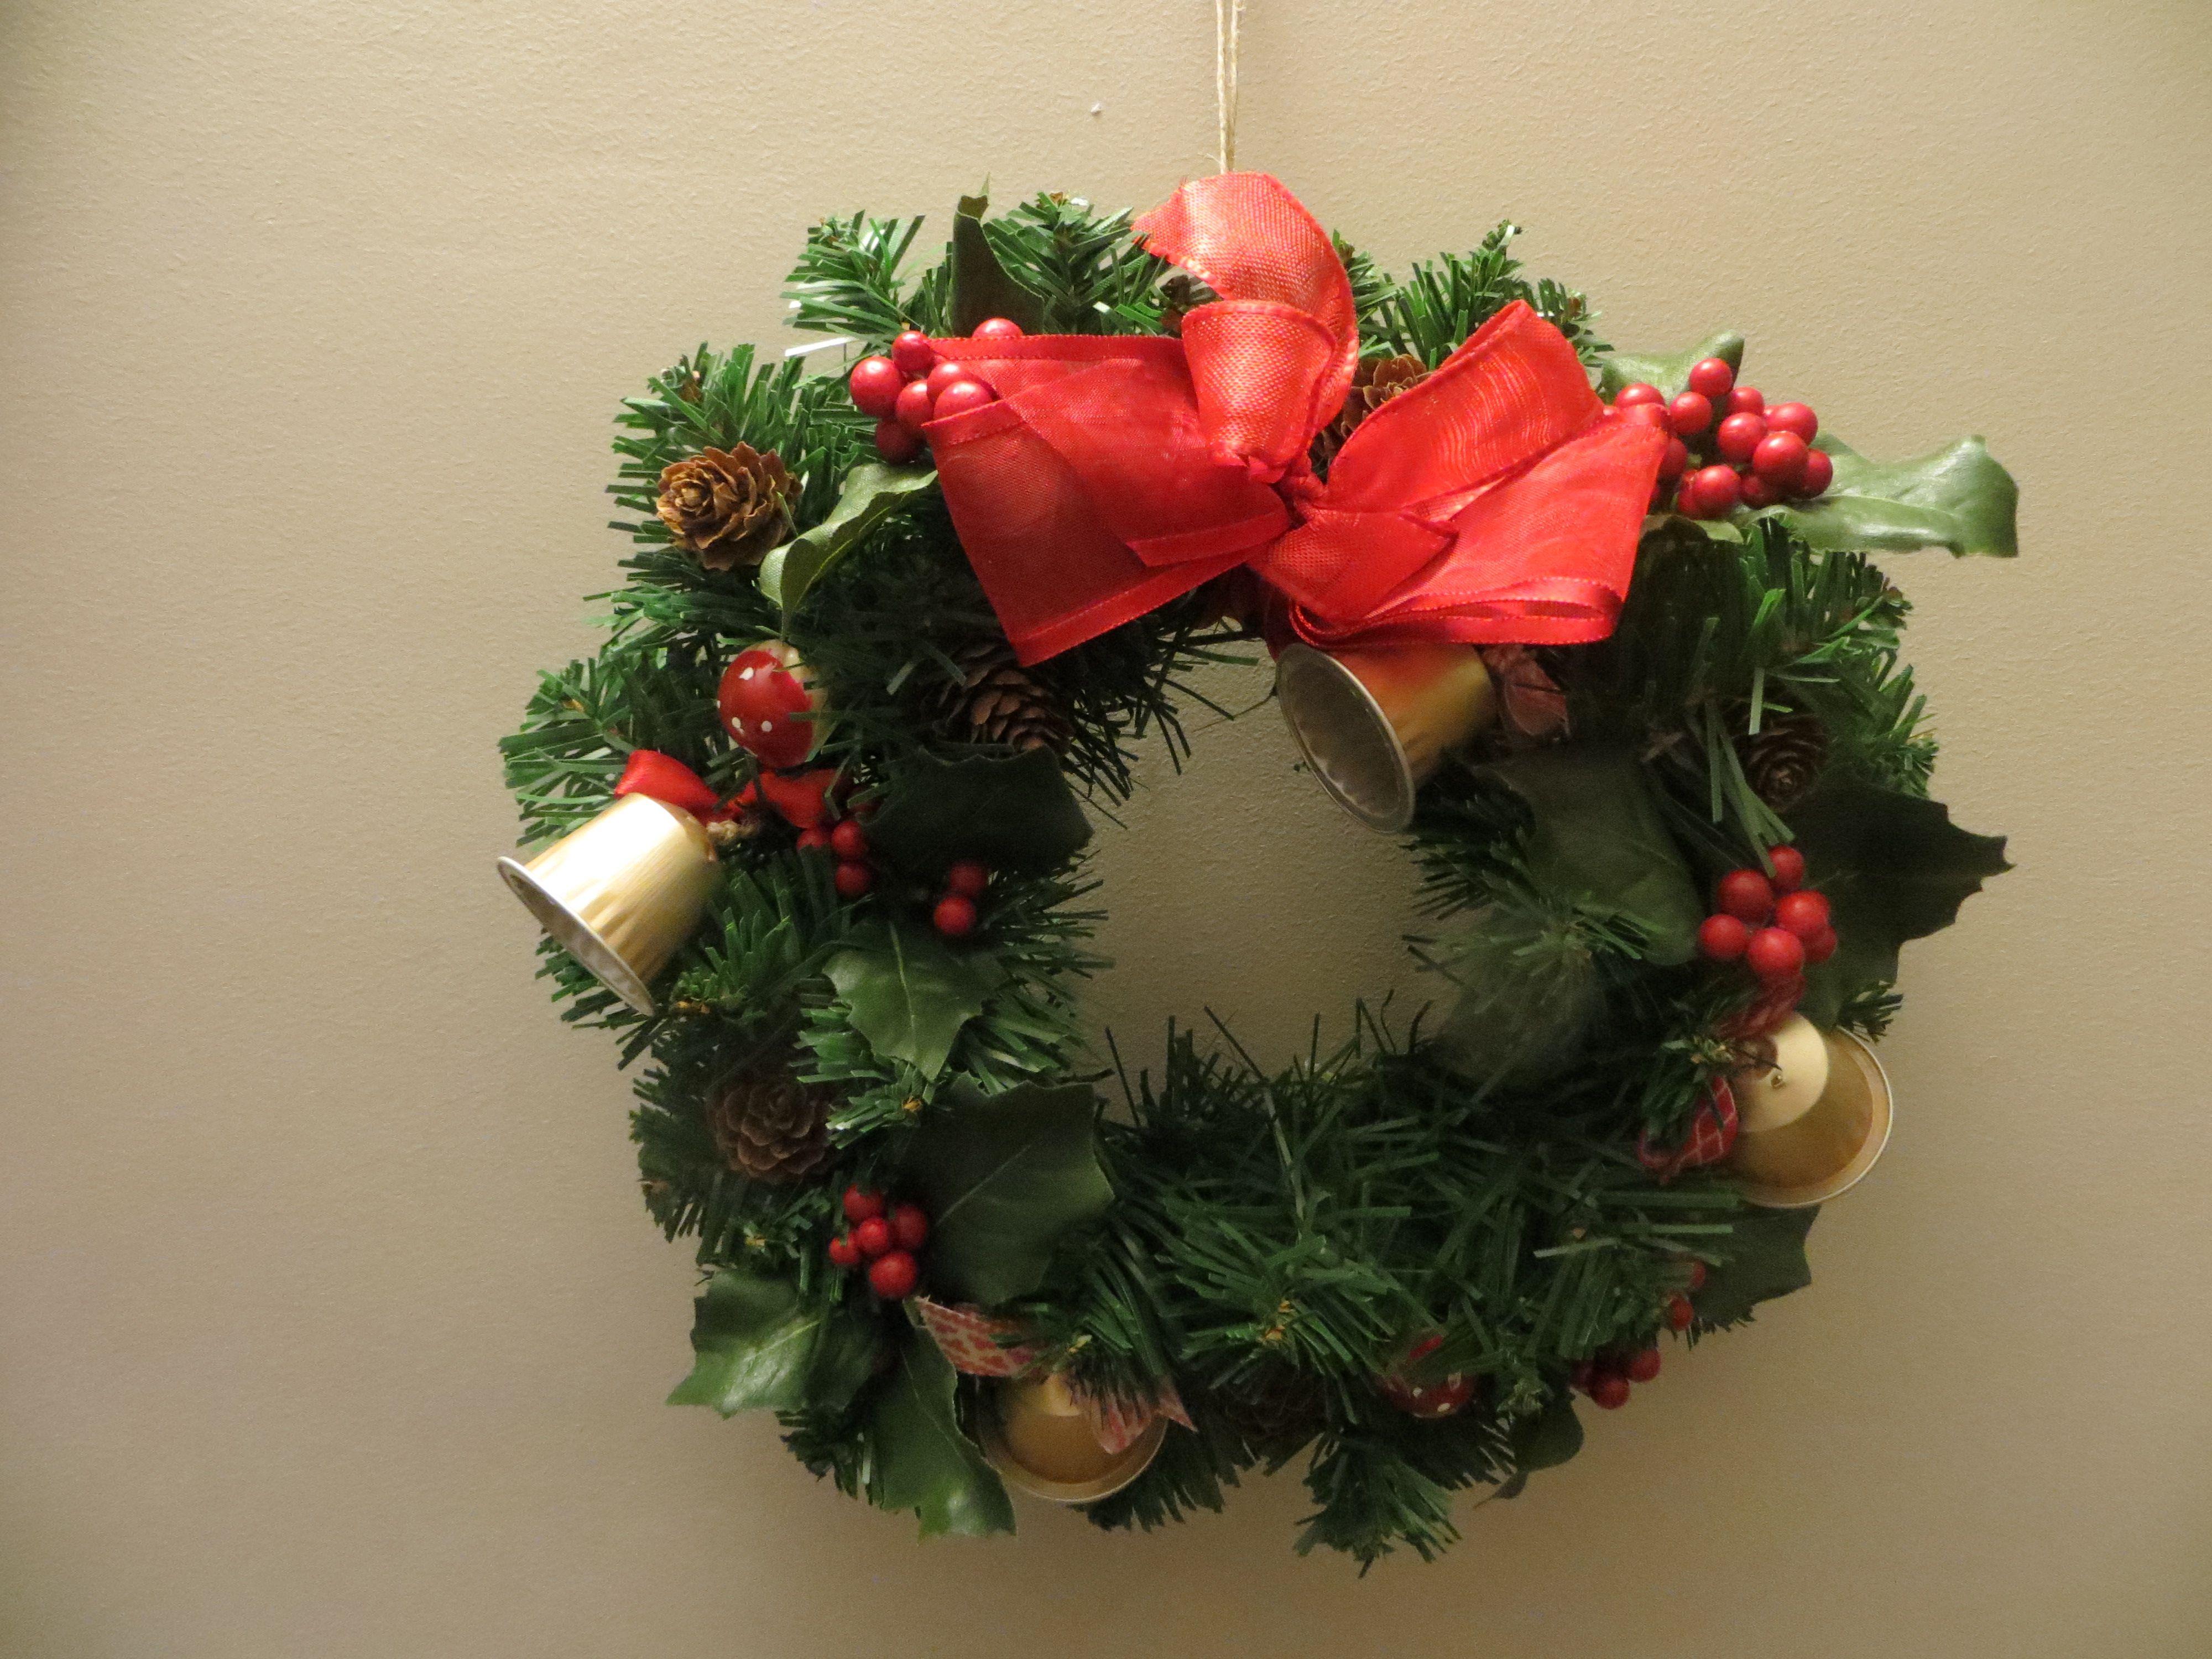 decorazione natalizia - ghirlanda